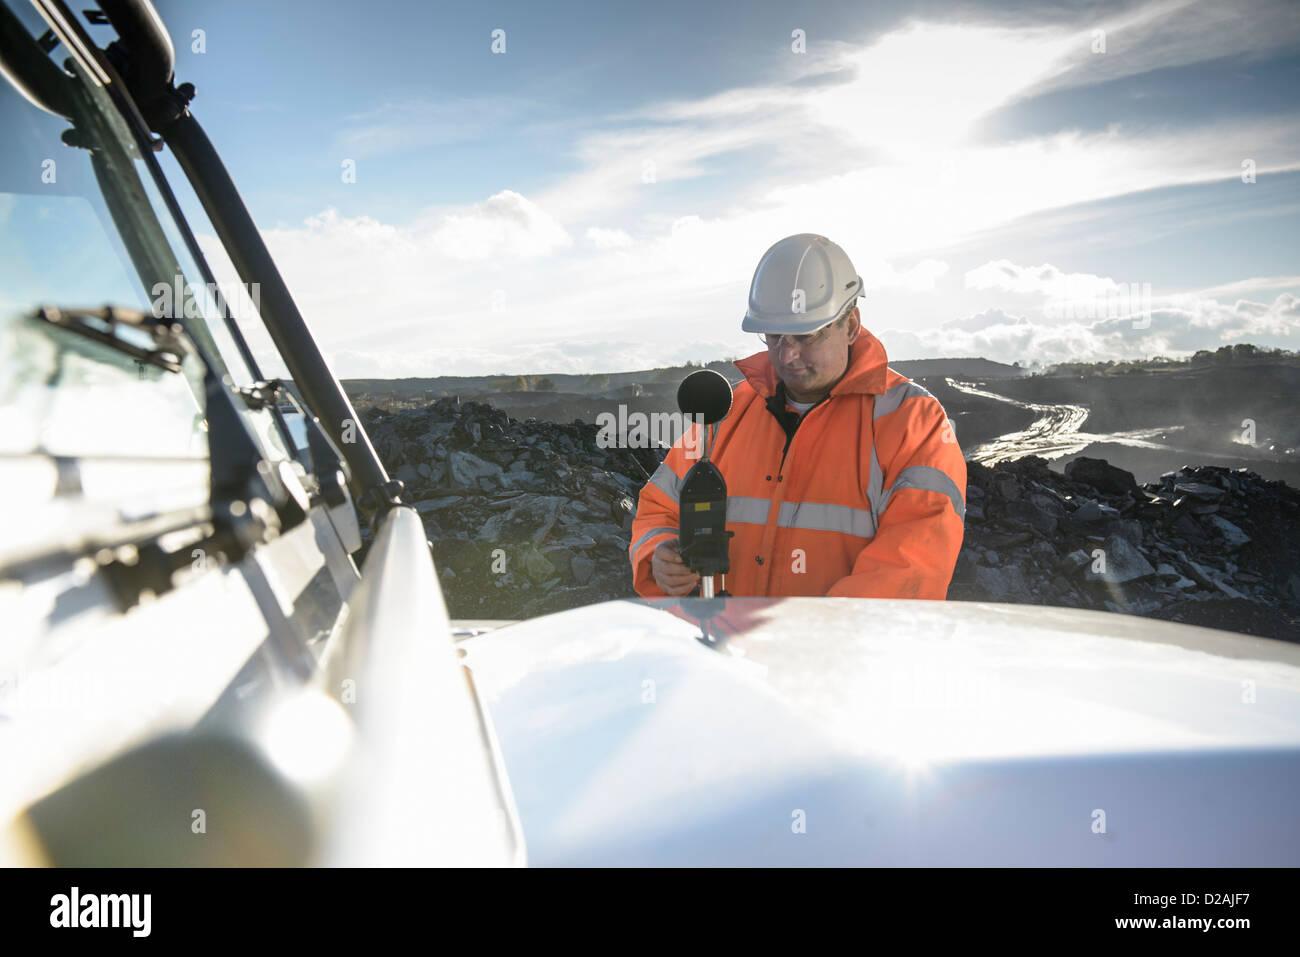 Worker using noise equipment on truck - Stock Image